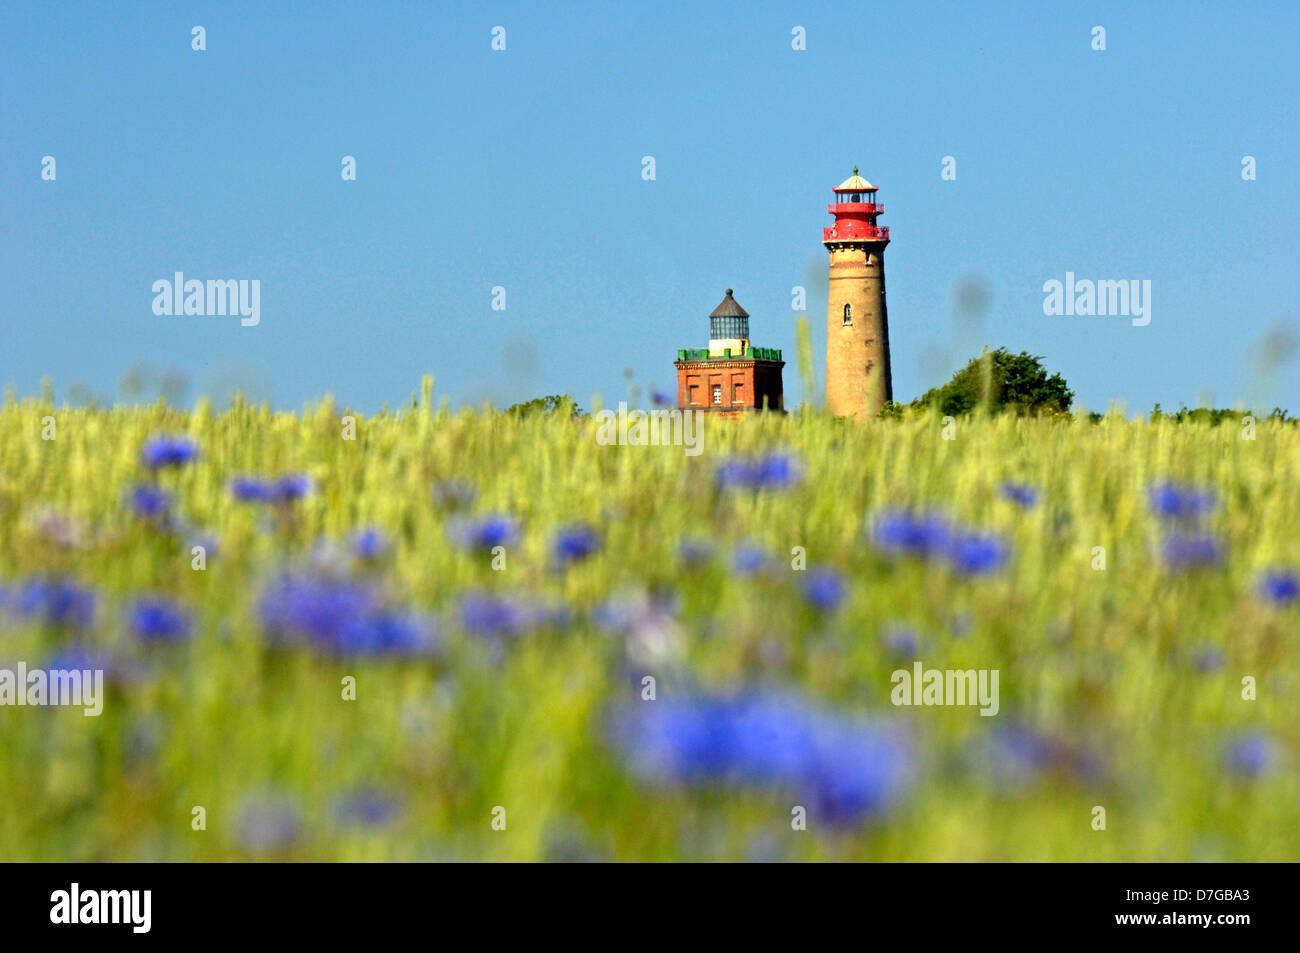 Germany, Mecklenburg-West Pomerania, island Rügen, cape Arkona, lighthouse - Stock Image